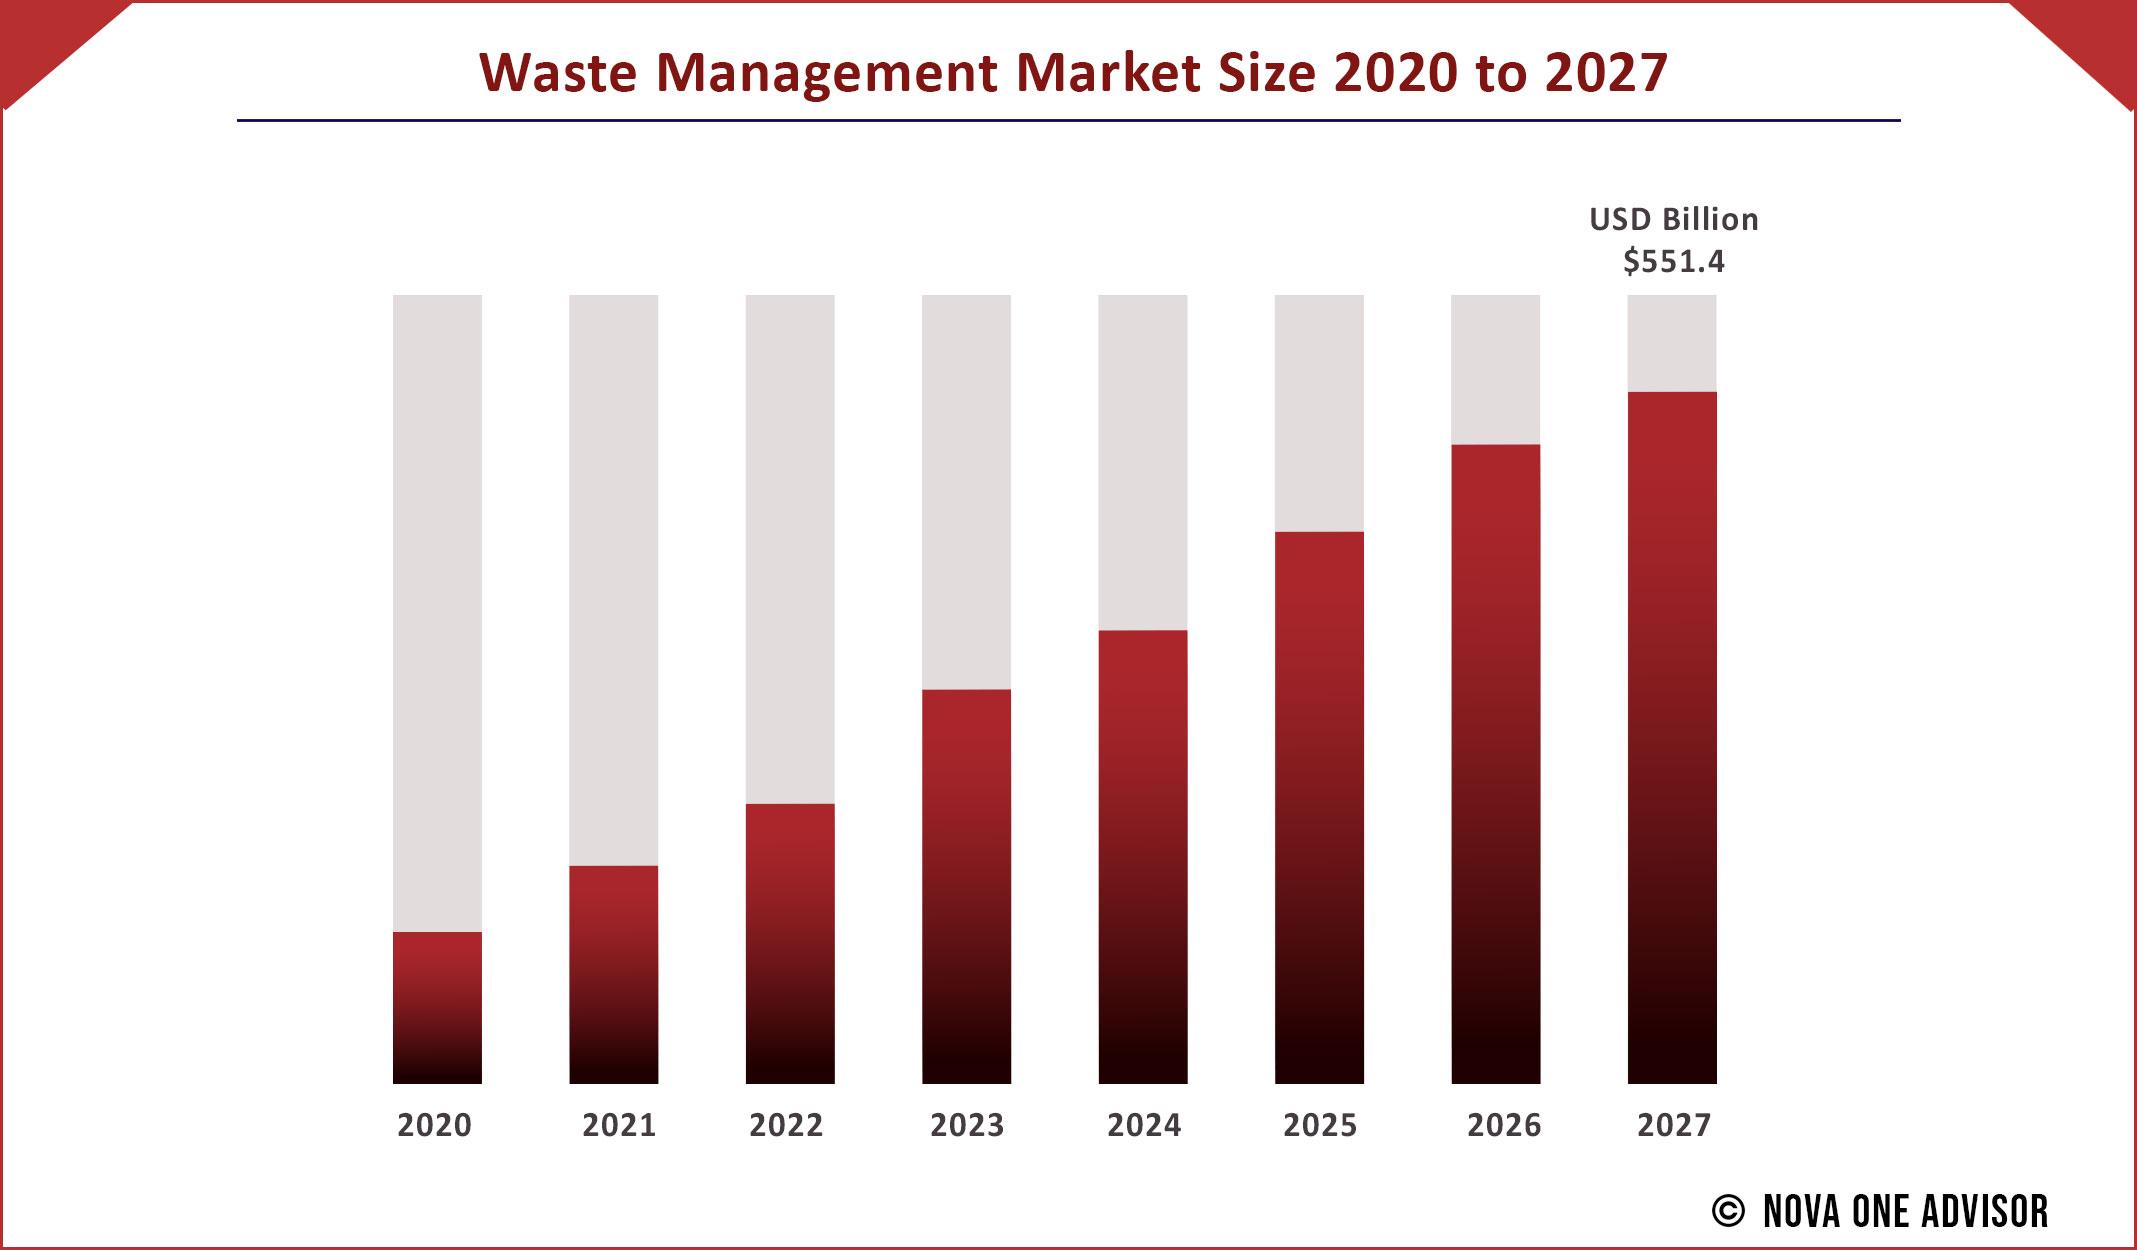 Waste Management Market Size 2020 to 2027